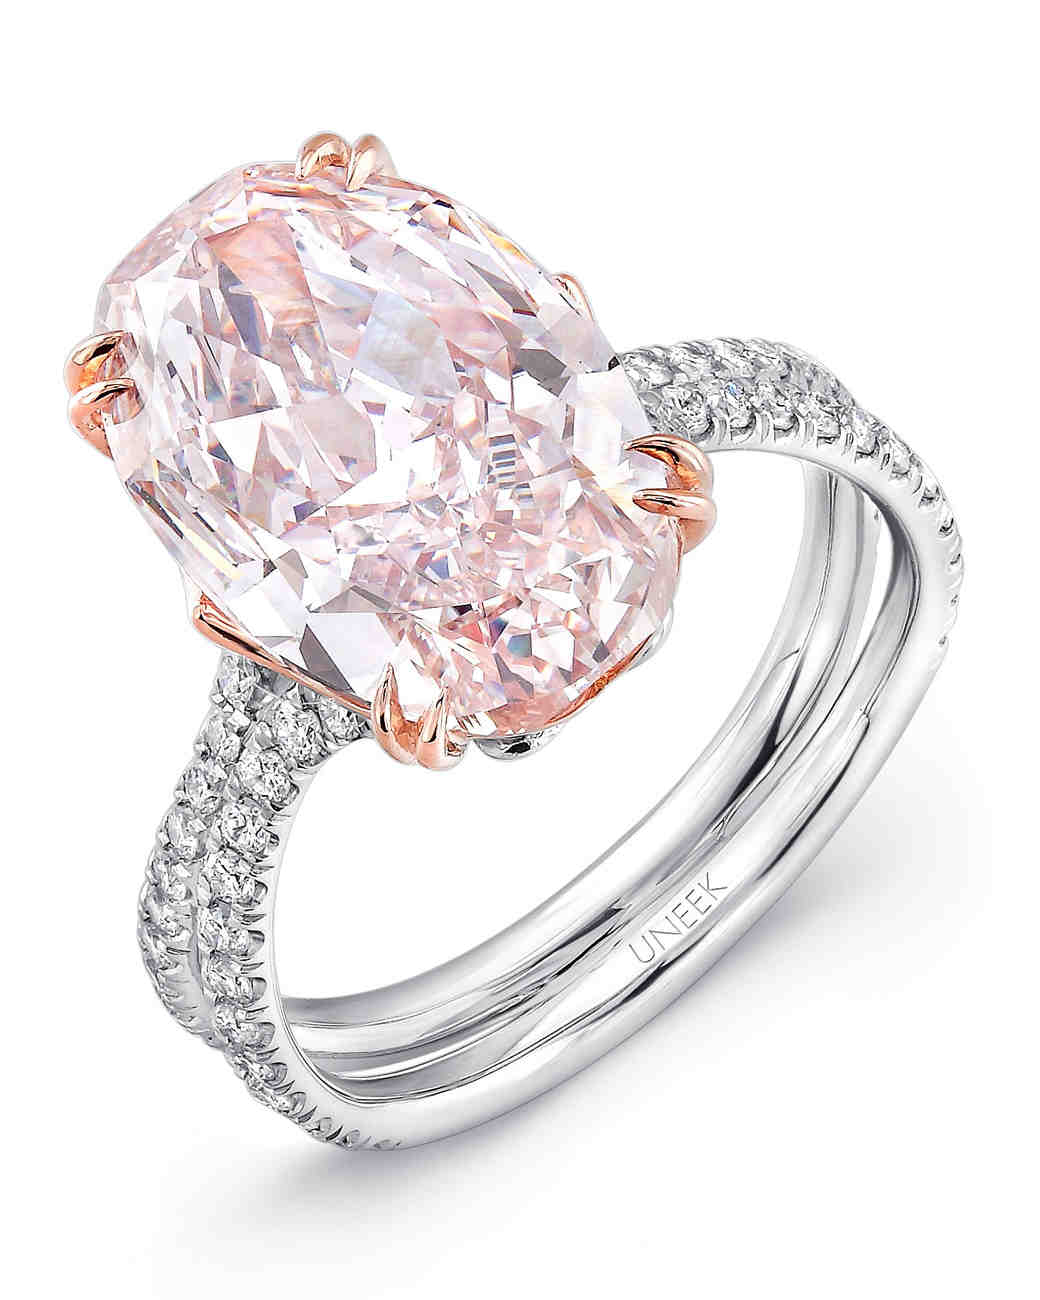 celebrity-rings-uneek-blake-lively-0316.jpg